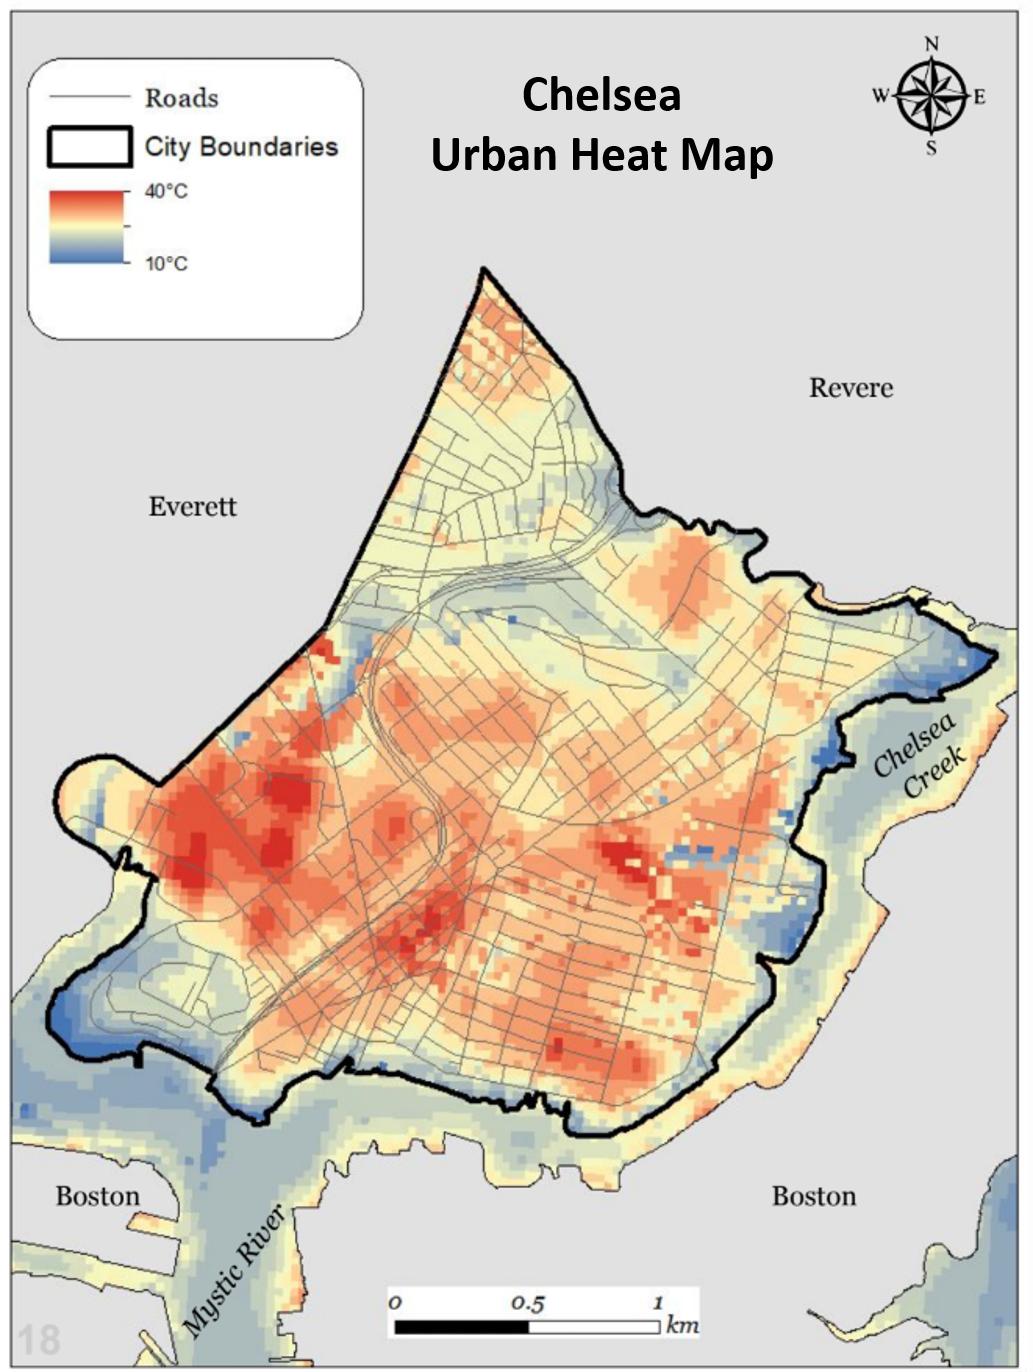 Chelsea heat map